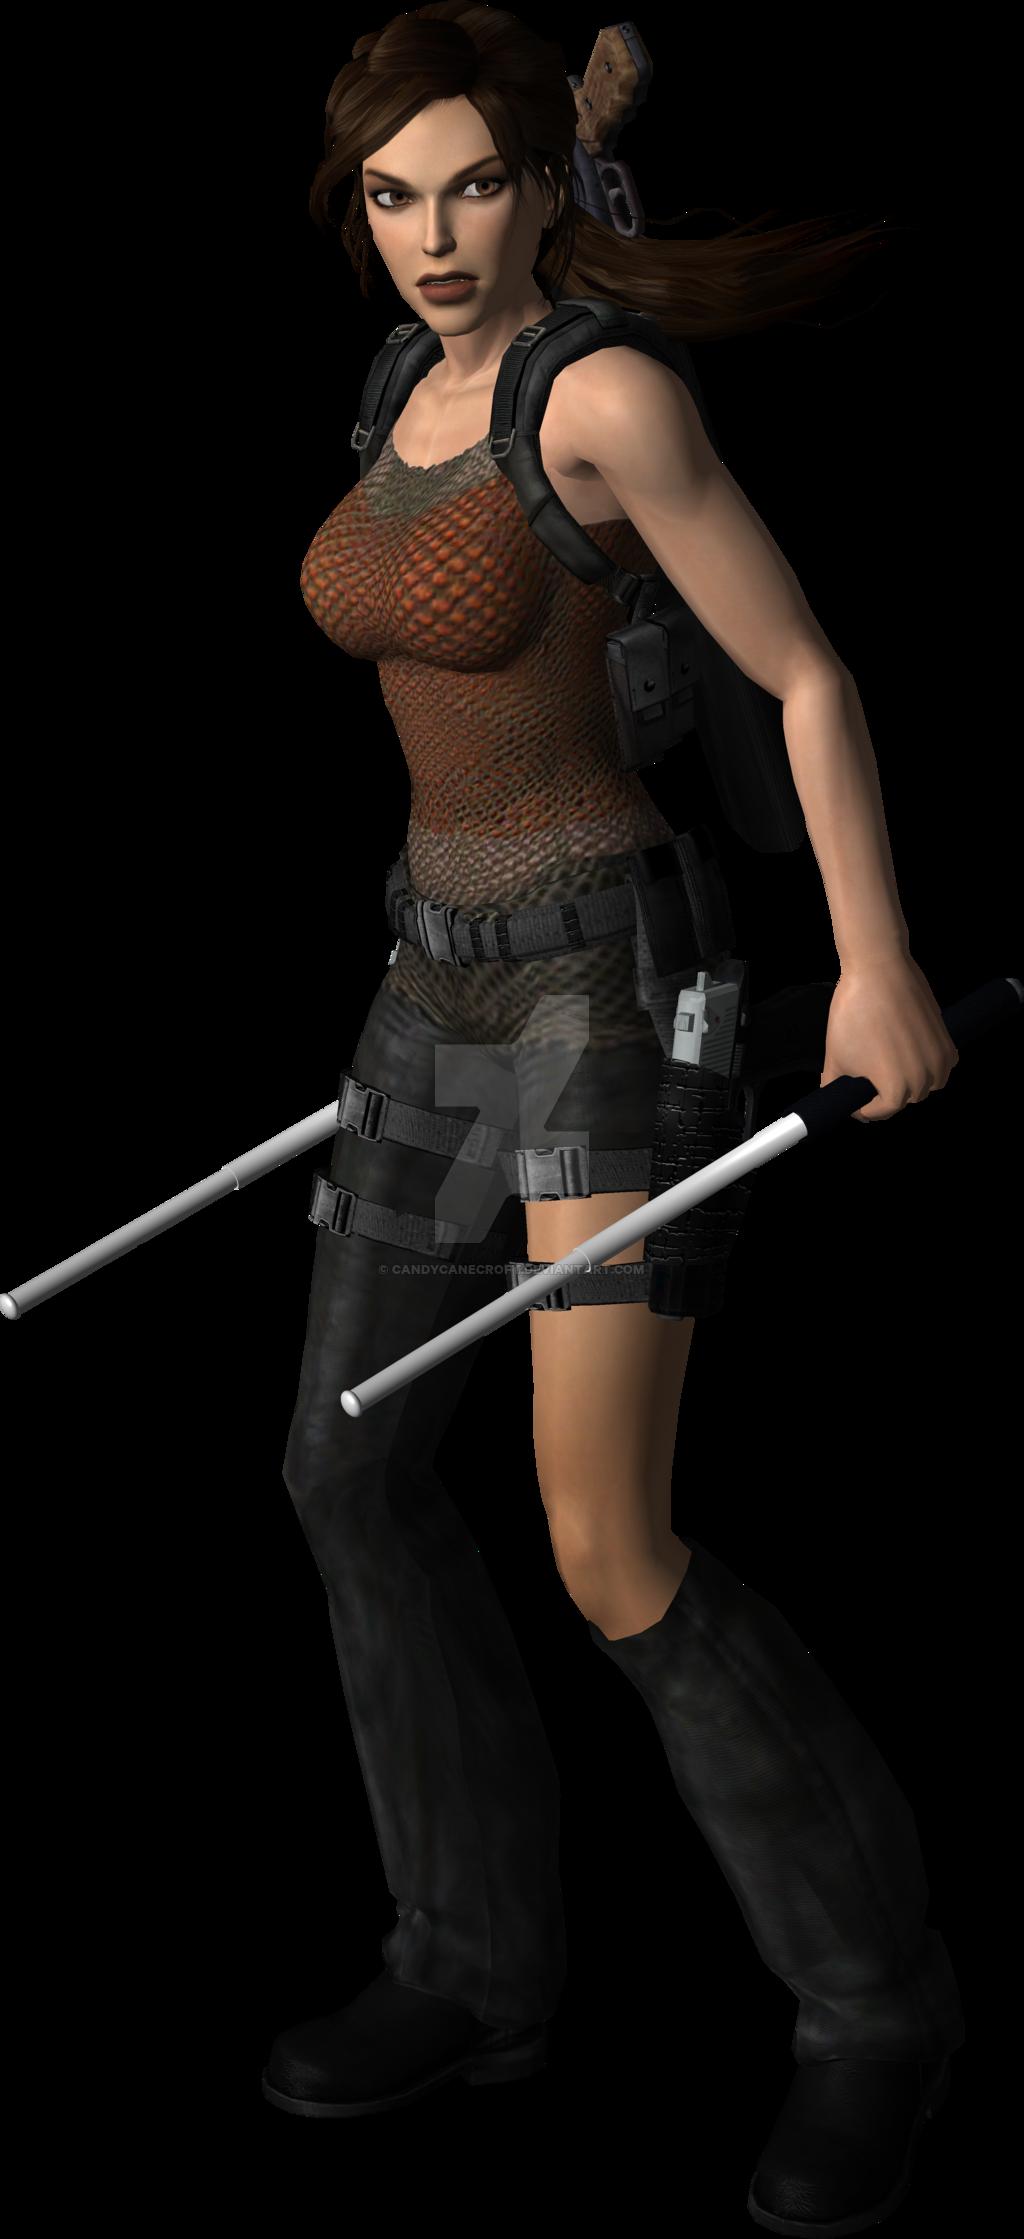 Lara Croft Tomb Raider Png Image Lara Croft Tomb Tomb Raider Lara Croft